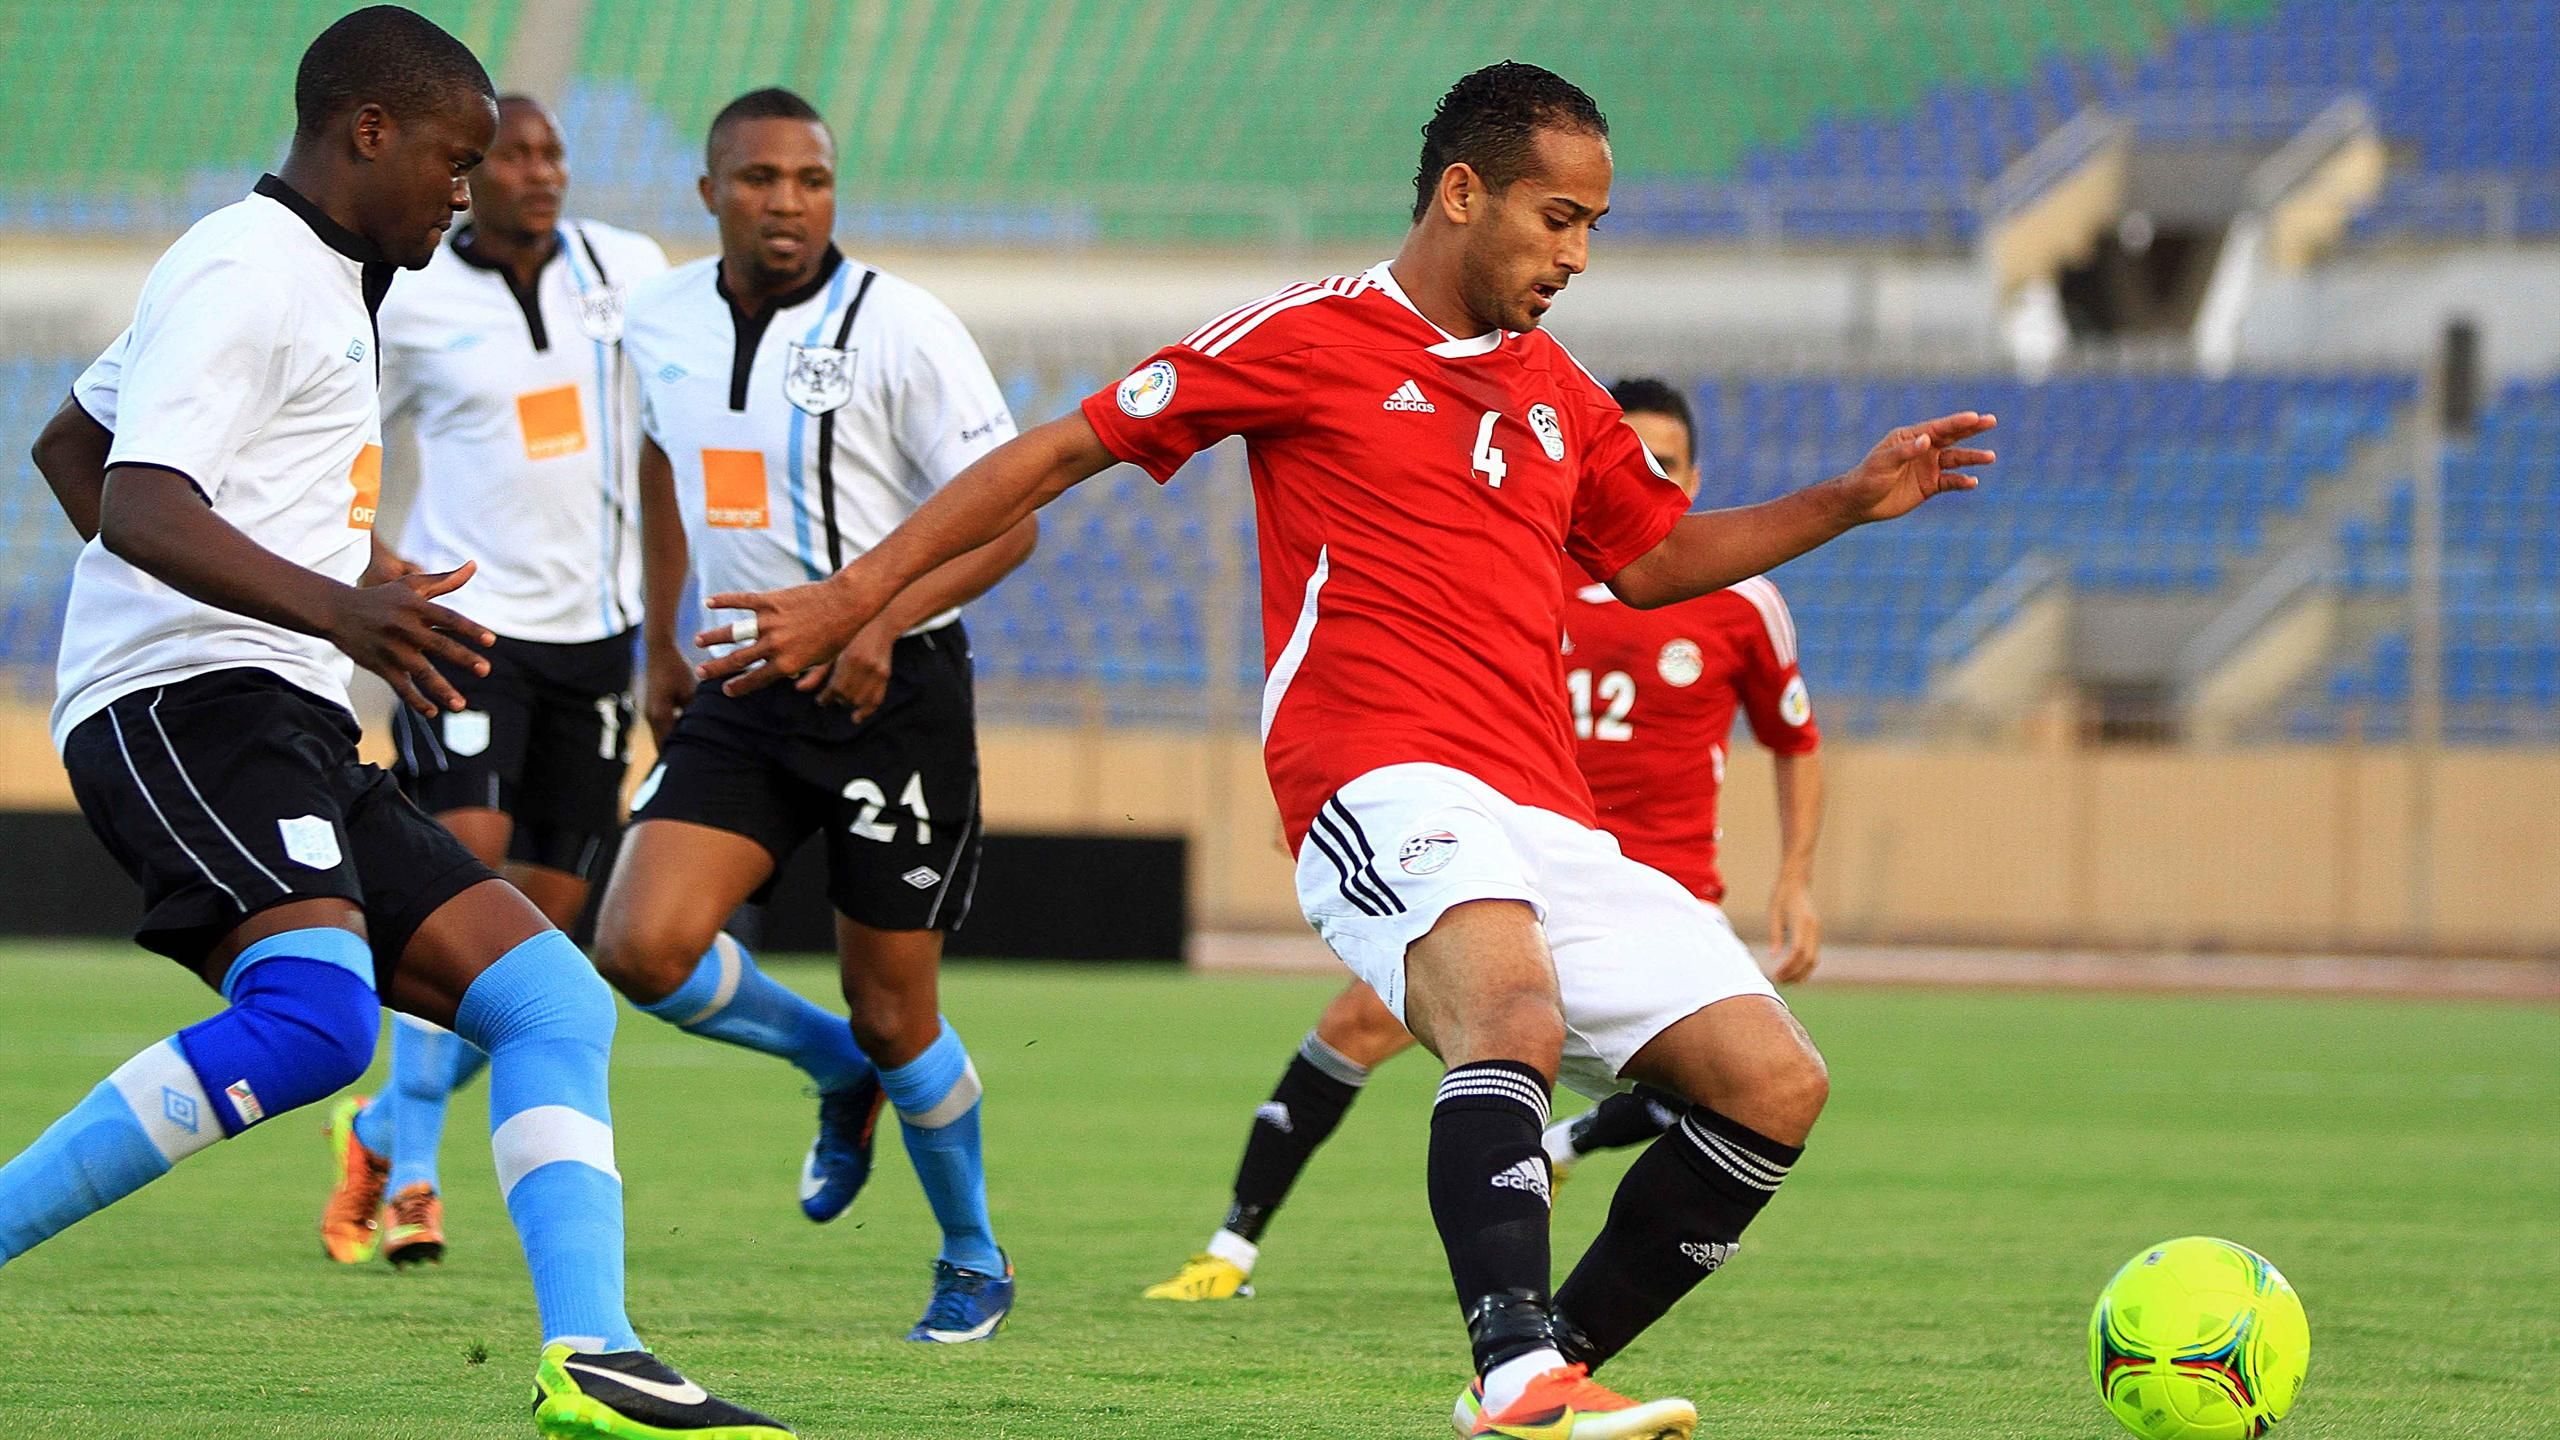 وليد سليمان مع منتخب مصر